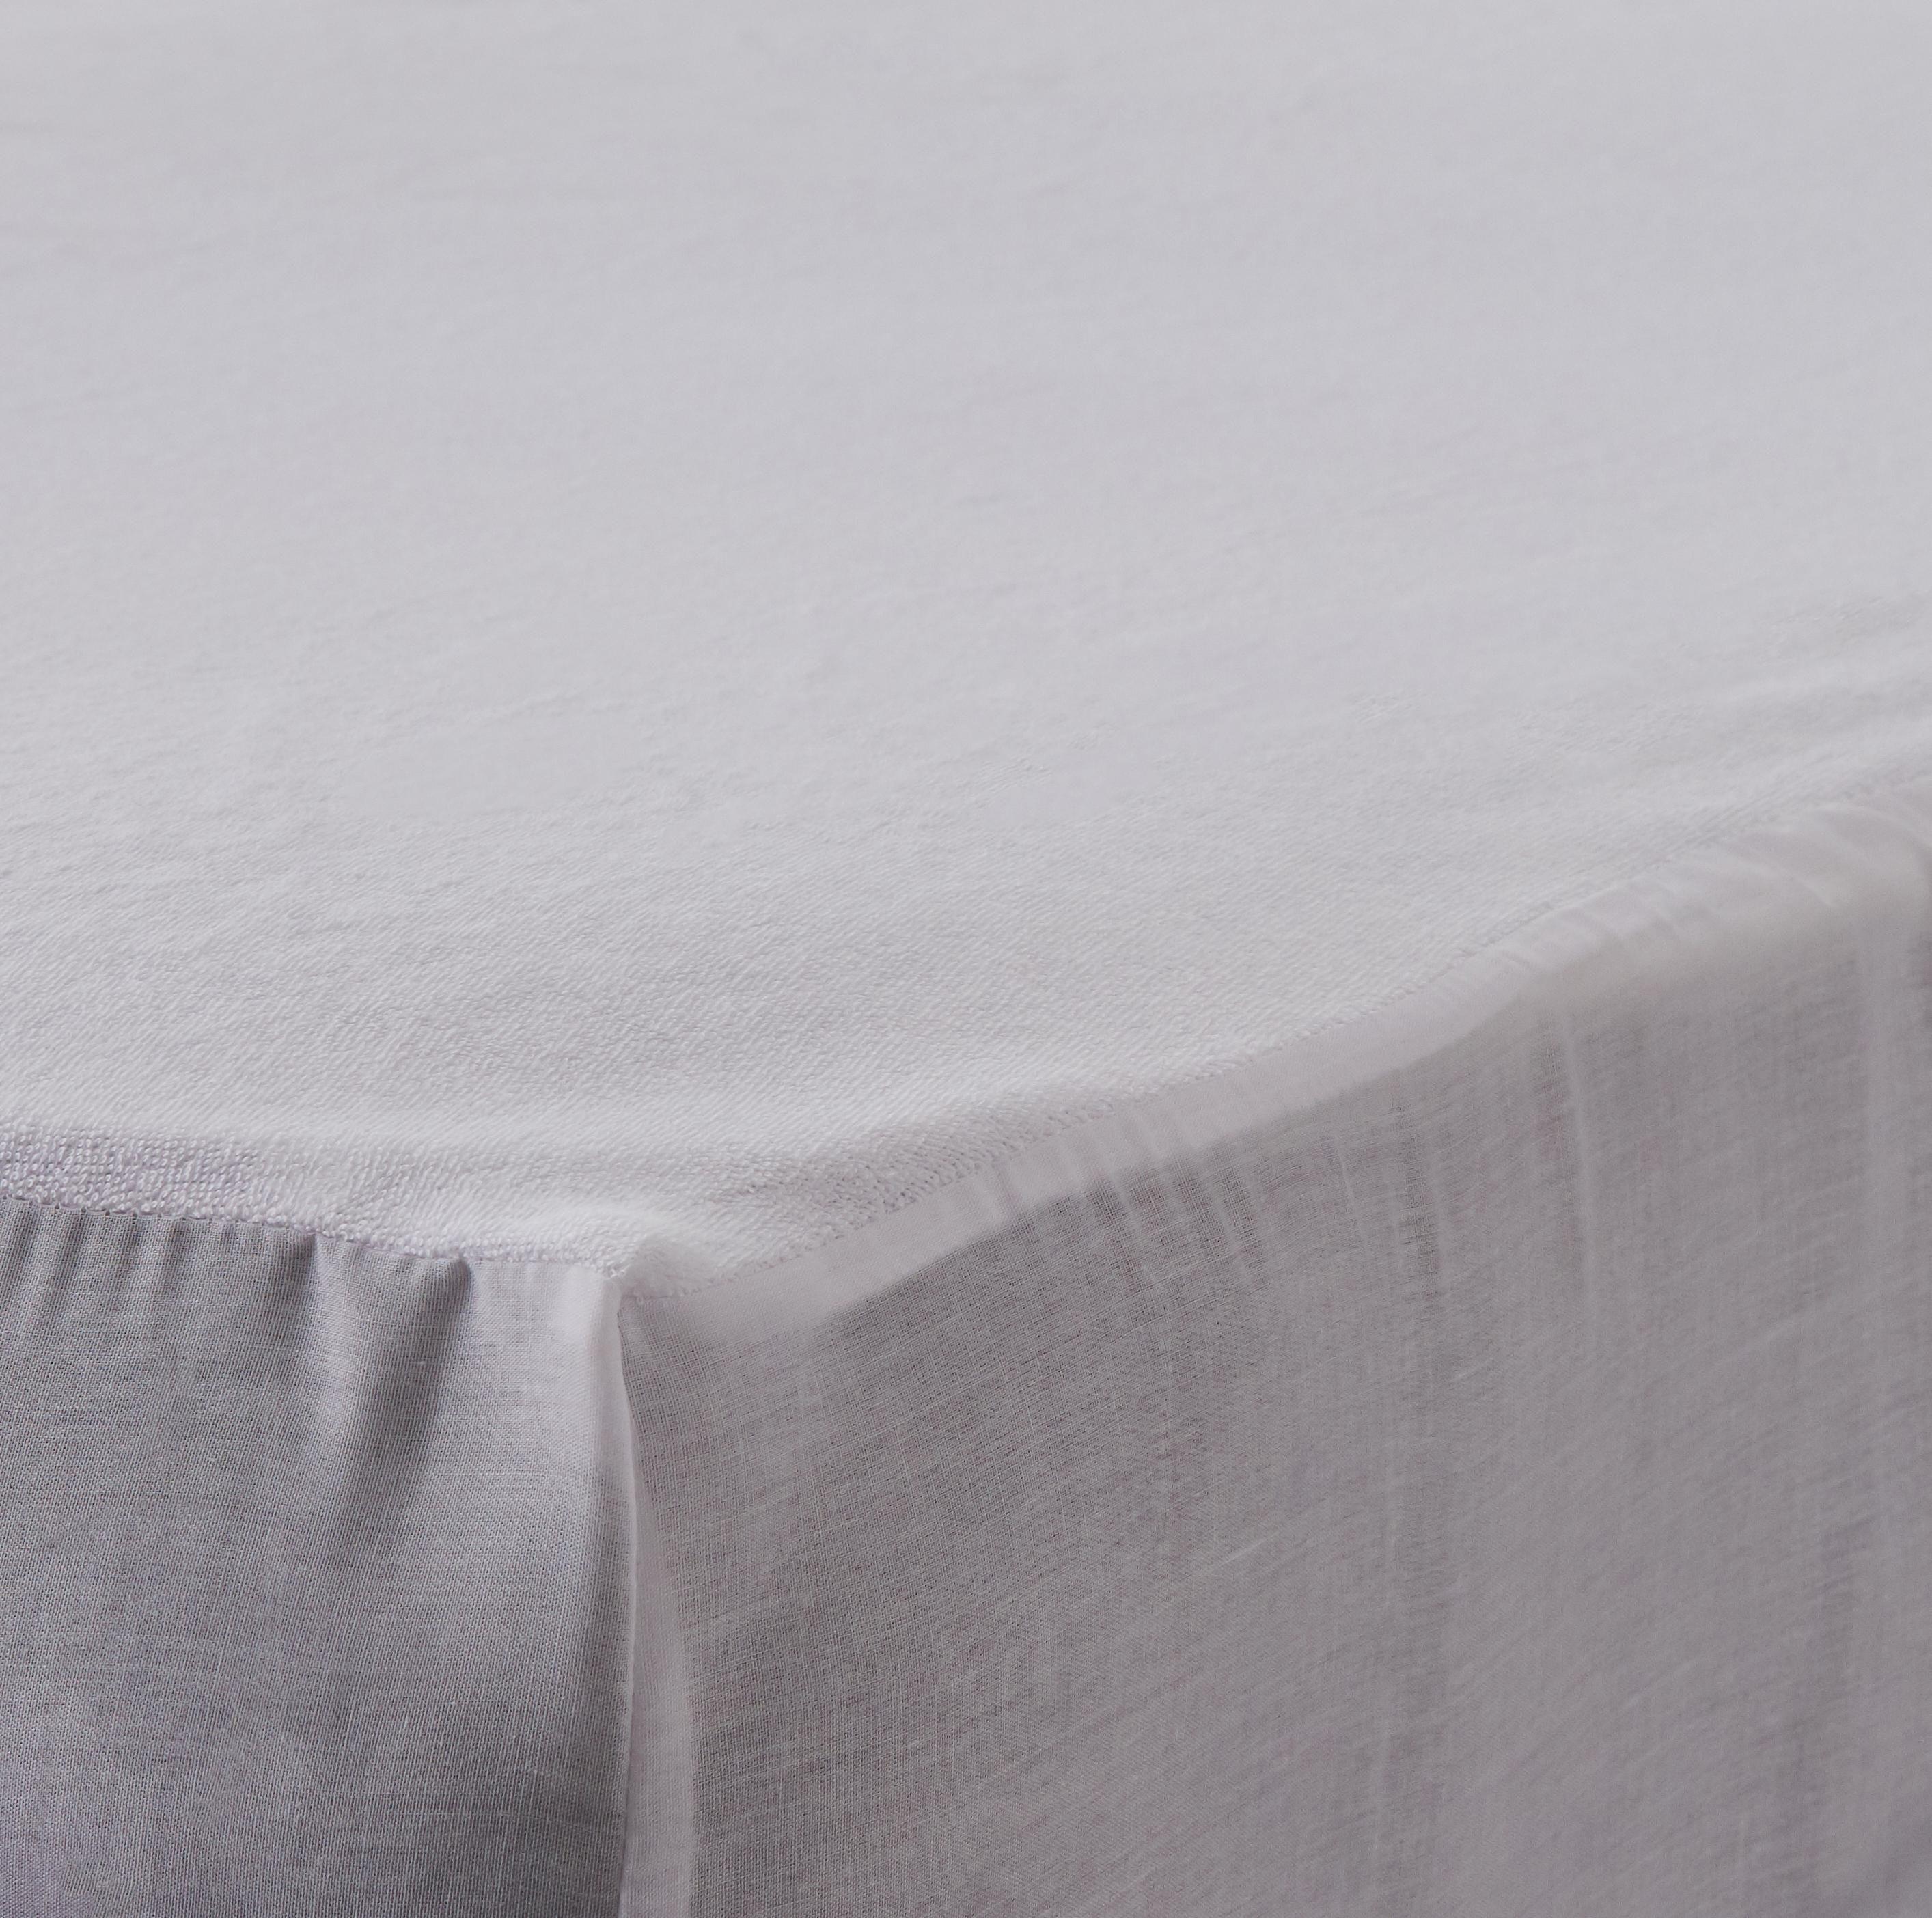 Dunelm Soft Waterproof Cotton White Double Mattress Protector Mattress Protector Mattress Comfort Mattress